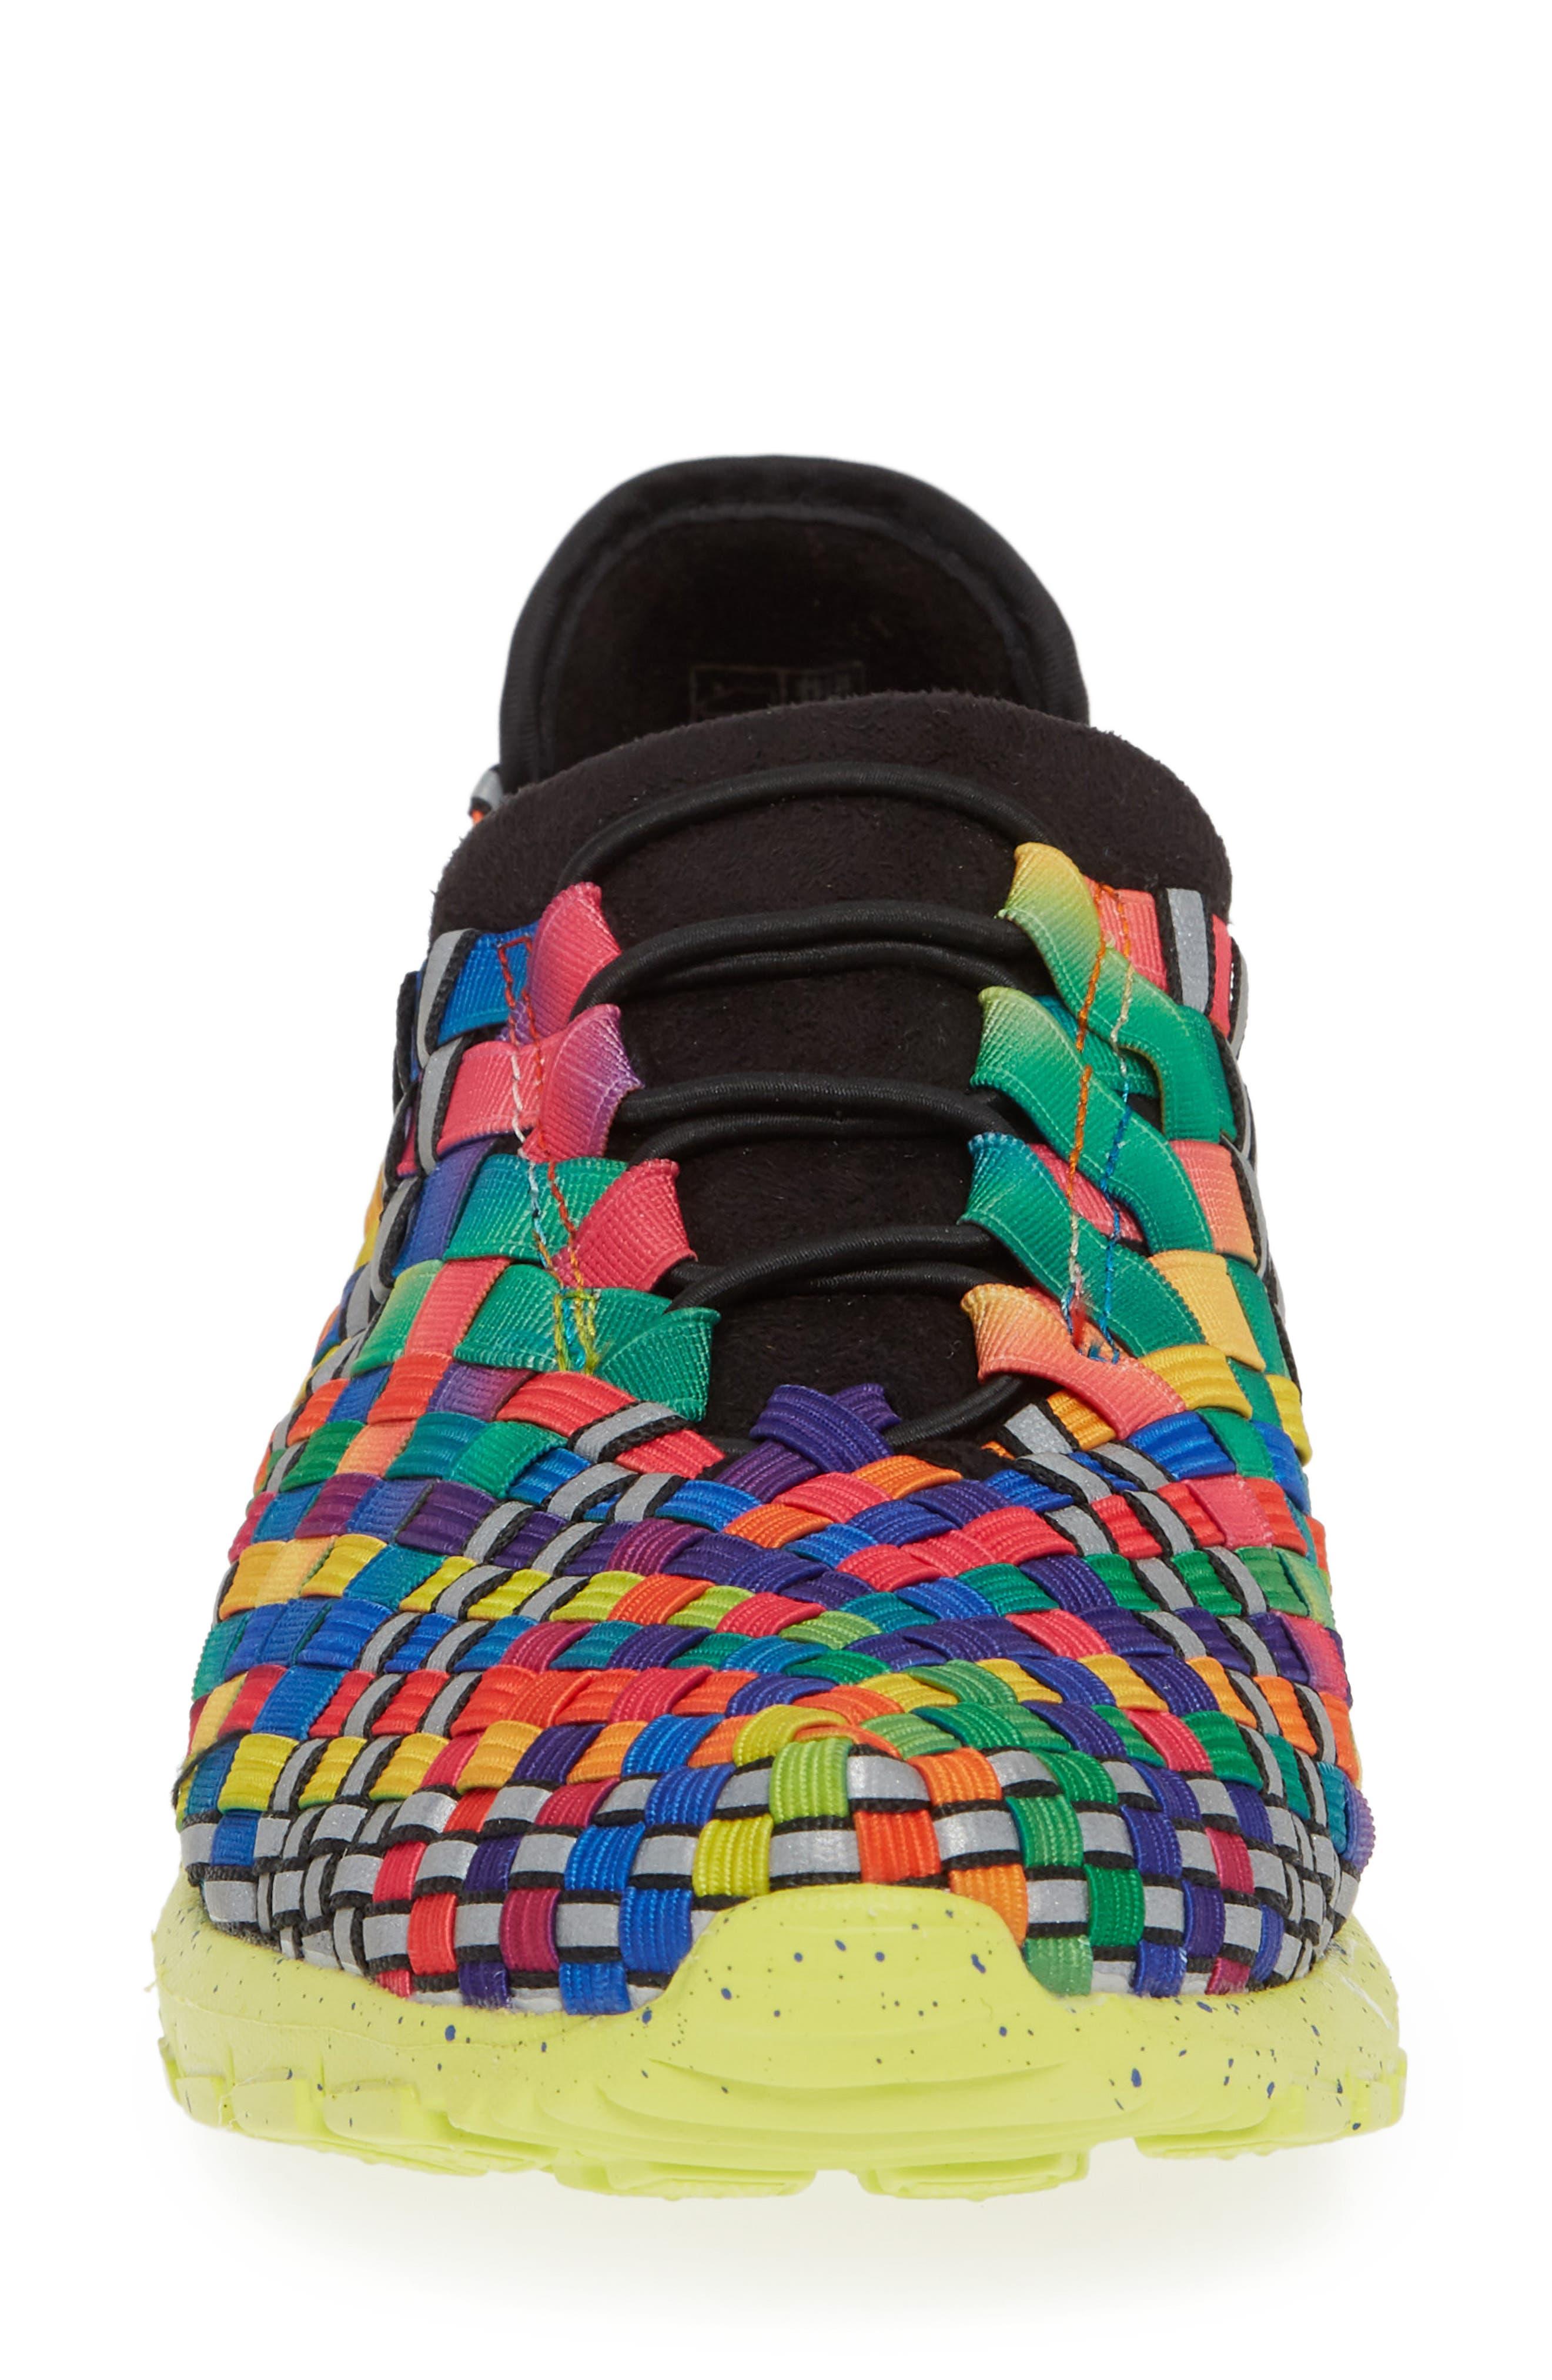 Runners Victoria Sneaker,                             Alternate thumbnail 4, color,                             Black Multi Reflective Fabric